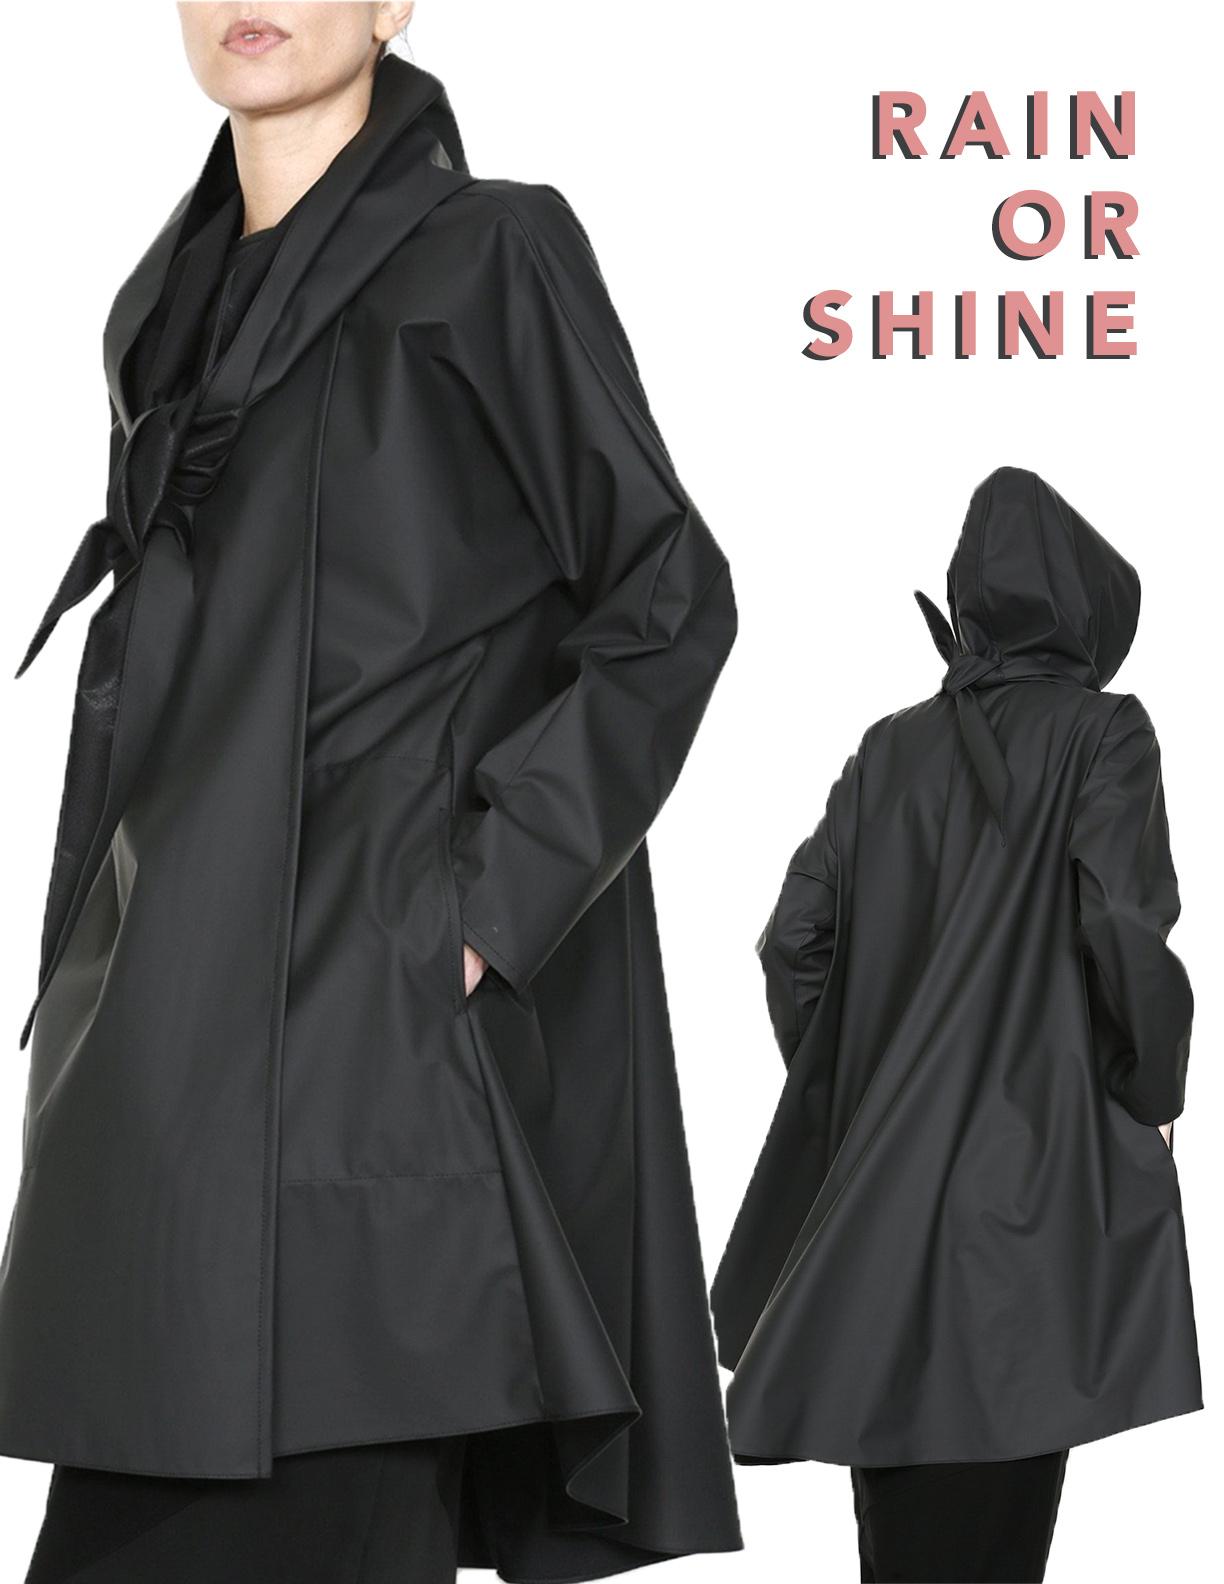 Raincoat Mailer4.jpg